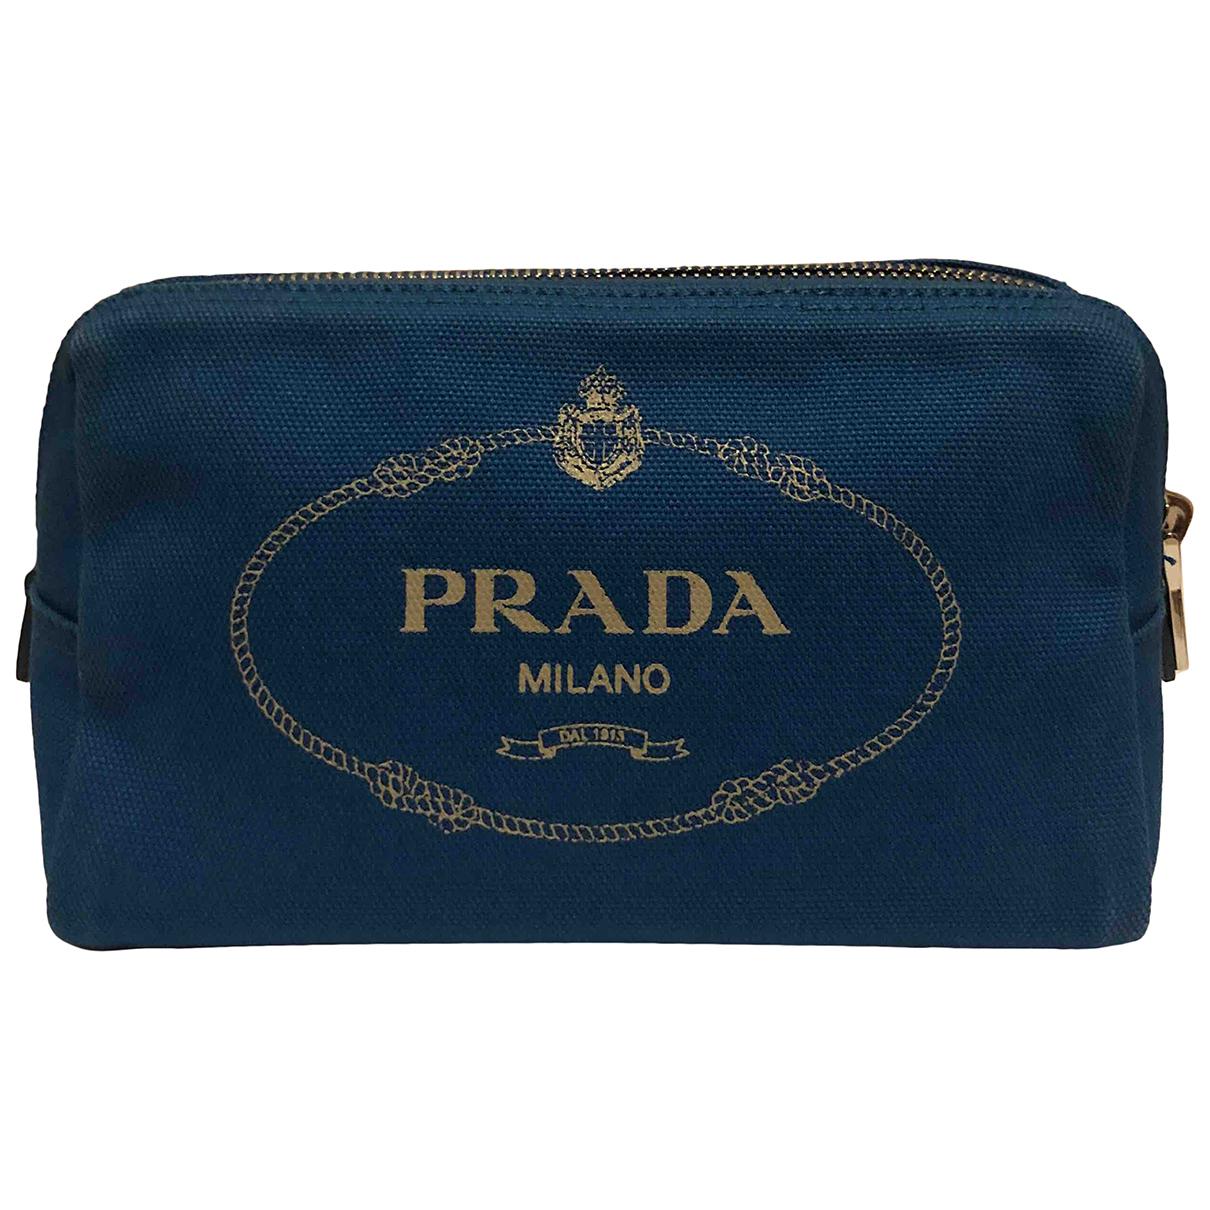 Prada - Petite maroquinerie   pour femme en coton - turquoise